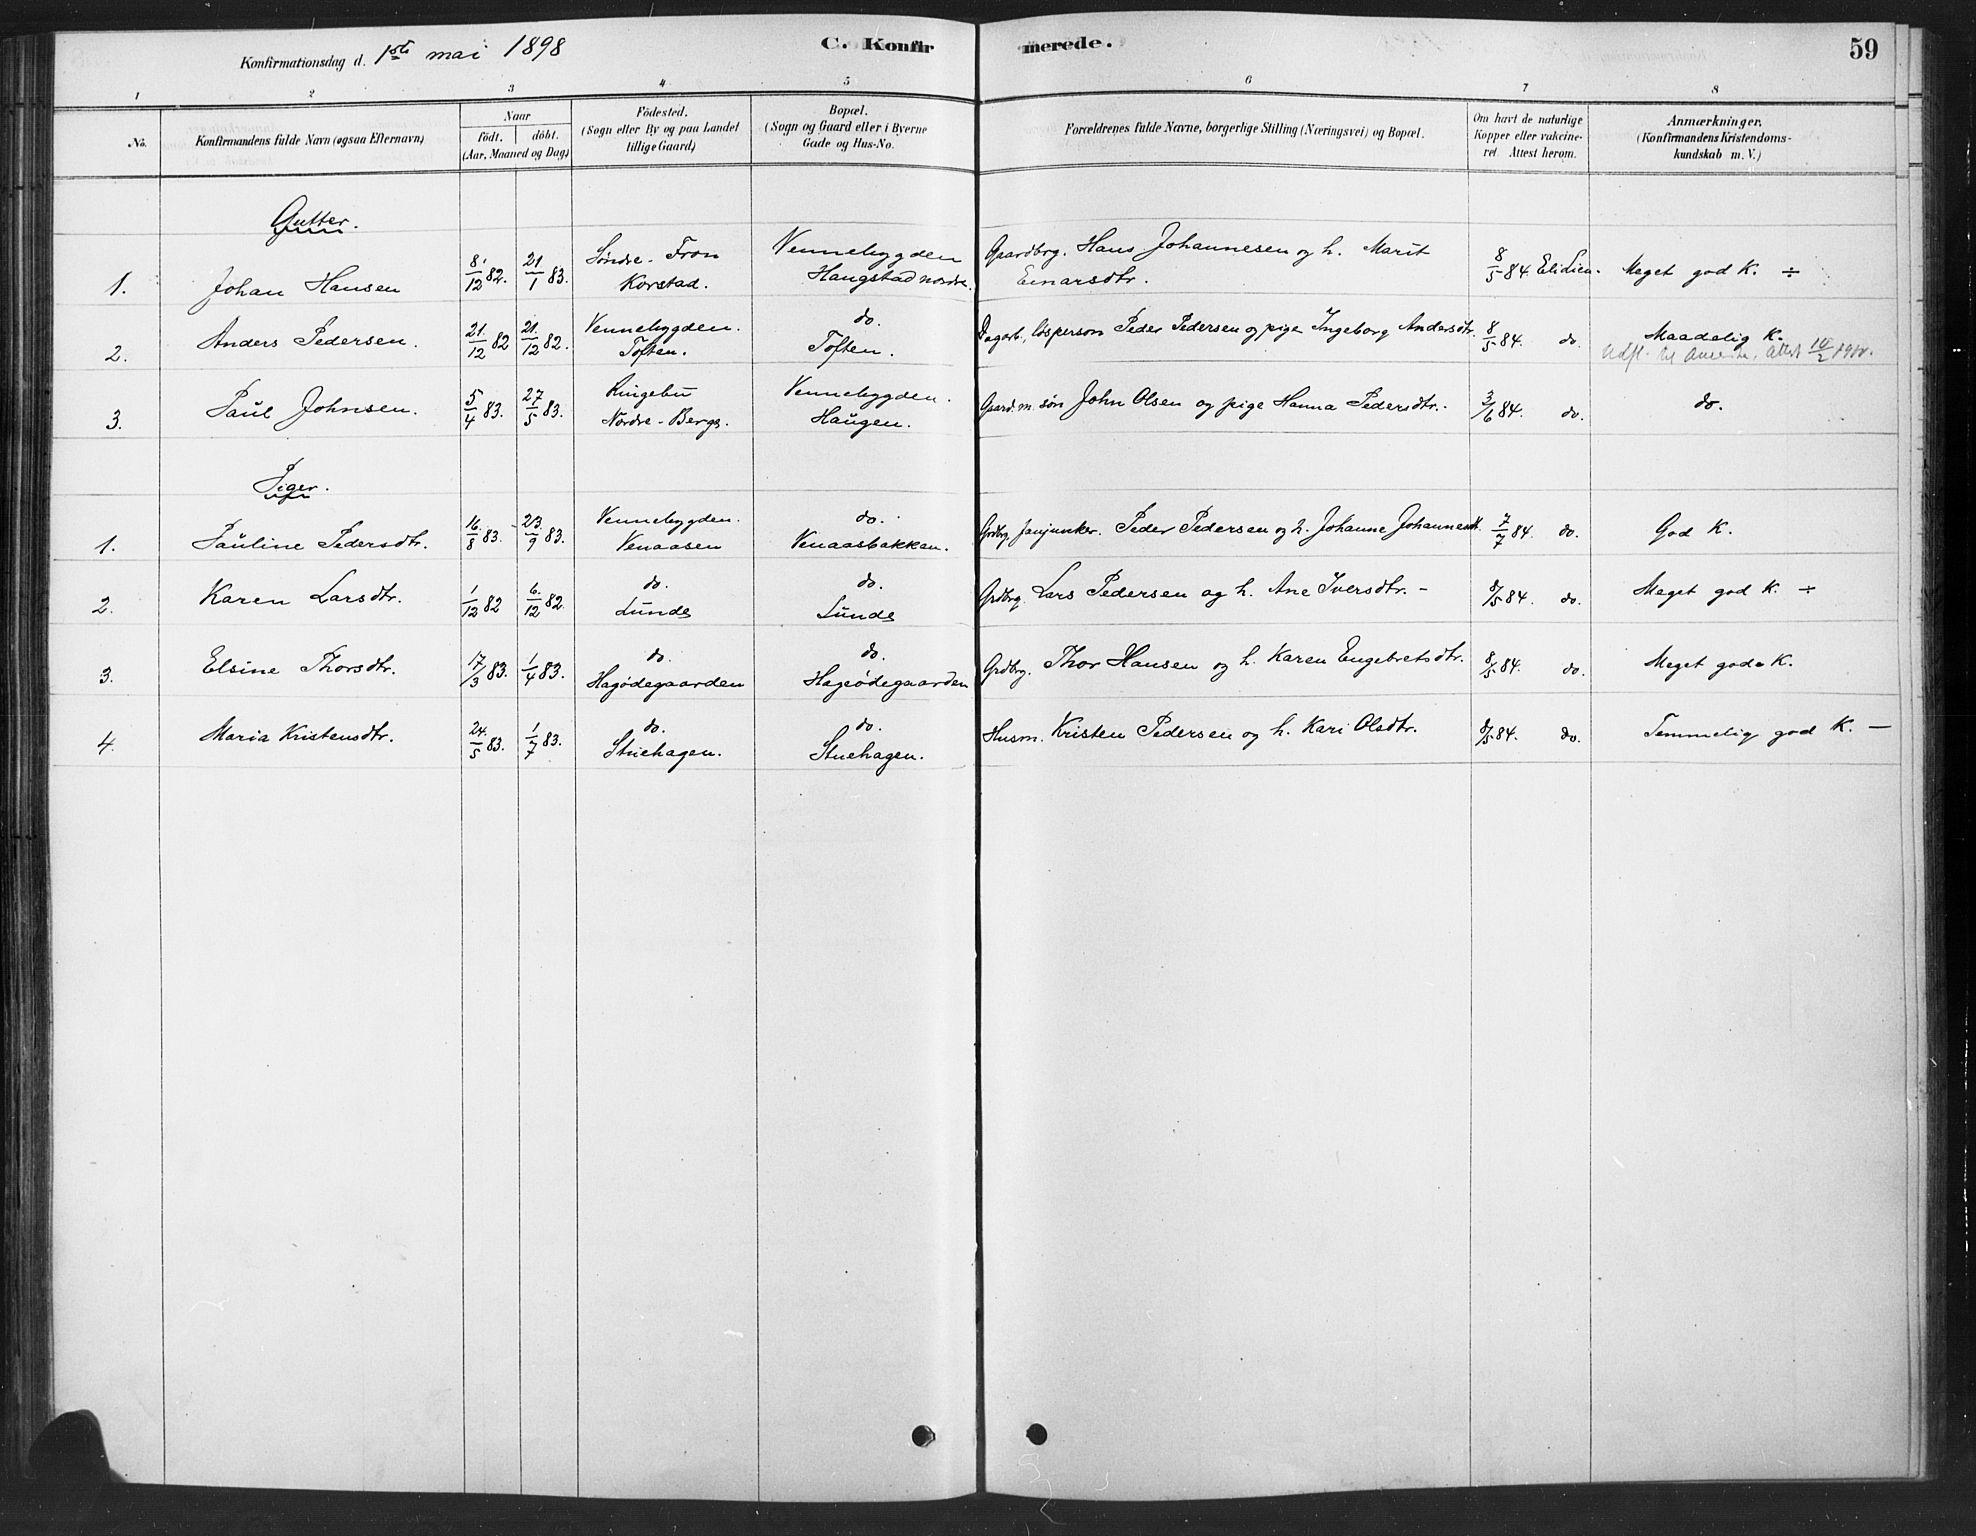 SAH, Ringebu prestekontor, Ministerialbok nr. 10, 1878-1898, s. 59